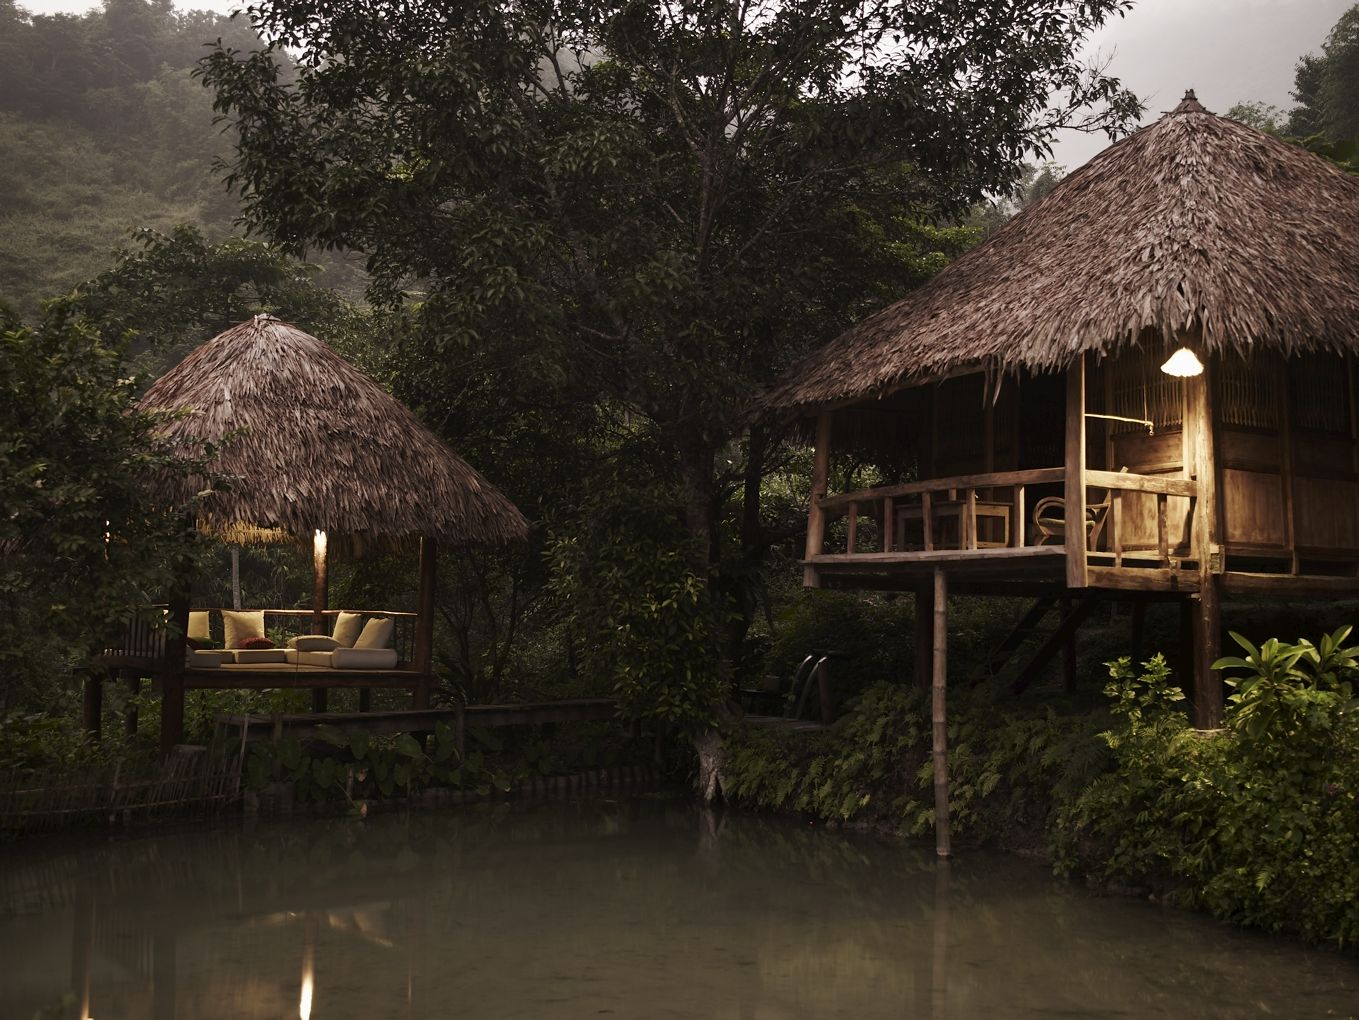 Les Bains De Hieu Ecolodge -  Pu Luong Nature Reserve